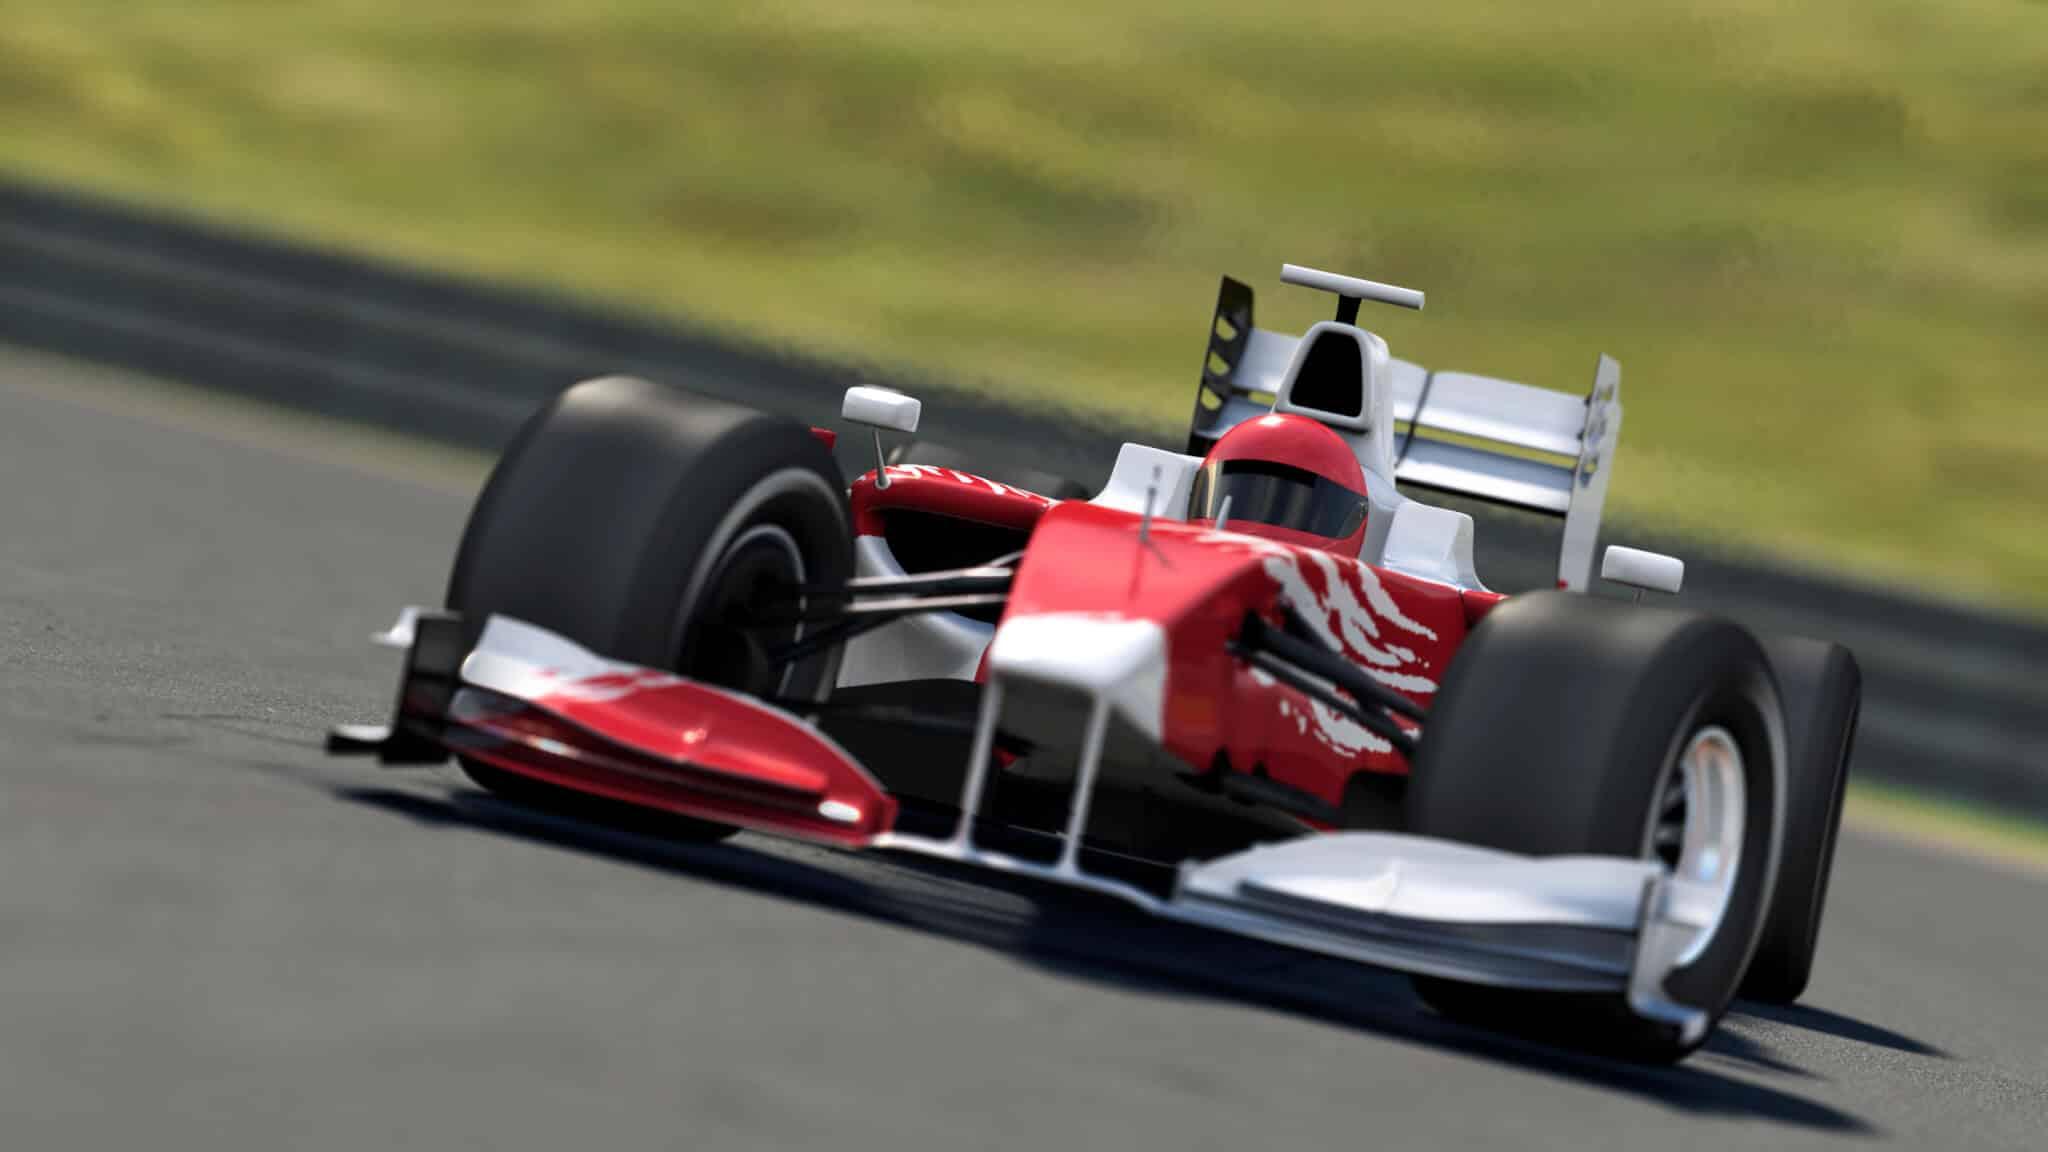 Motor racing sponsorship was tax deductible